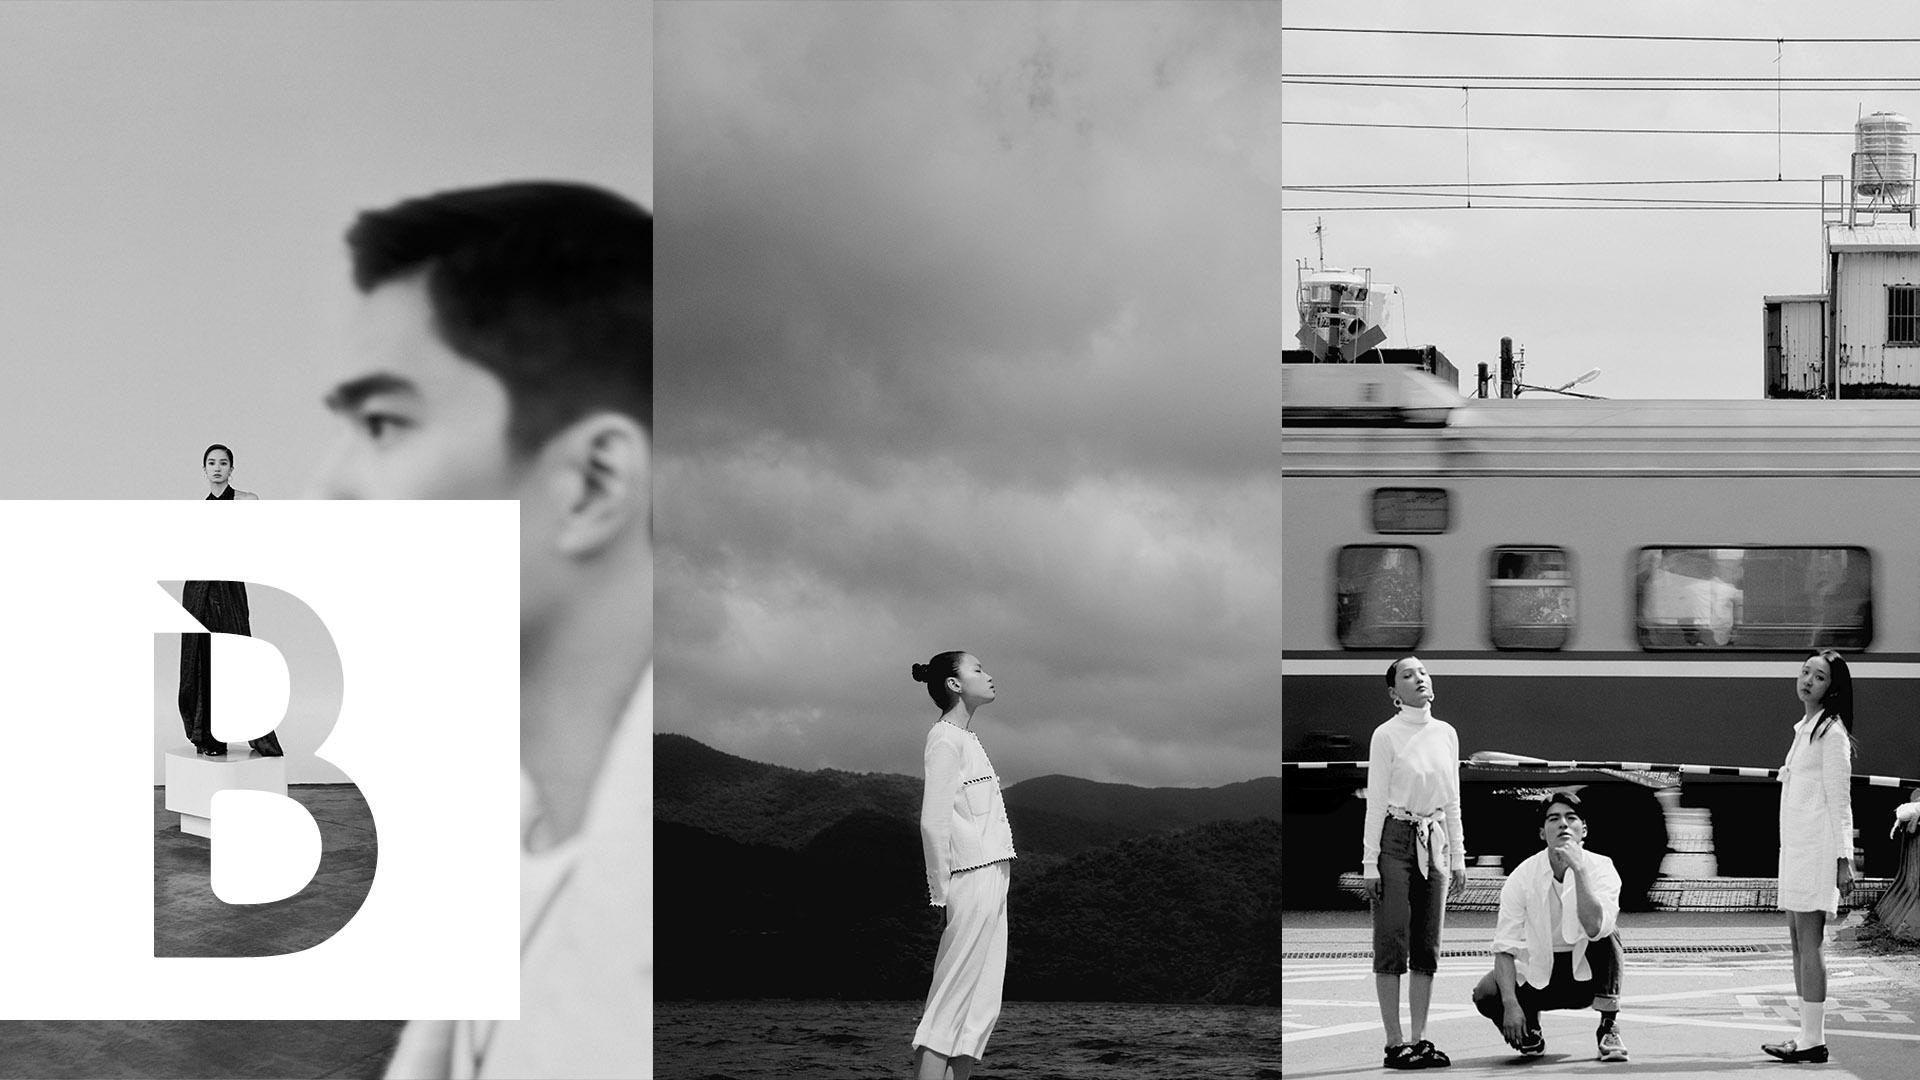 《Bella Style》2021春季號.島,The Trip-曾敬驊、陳昊森、李沐、林映唯、韓寧...大明星帶路帶你看見台灣不同的美!